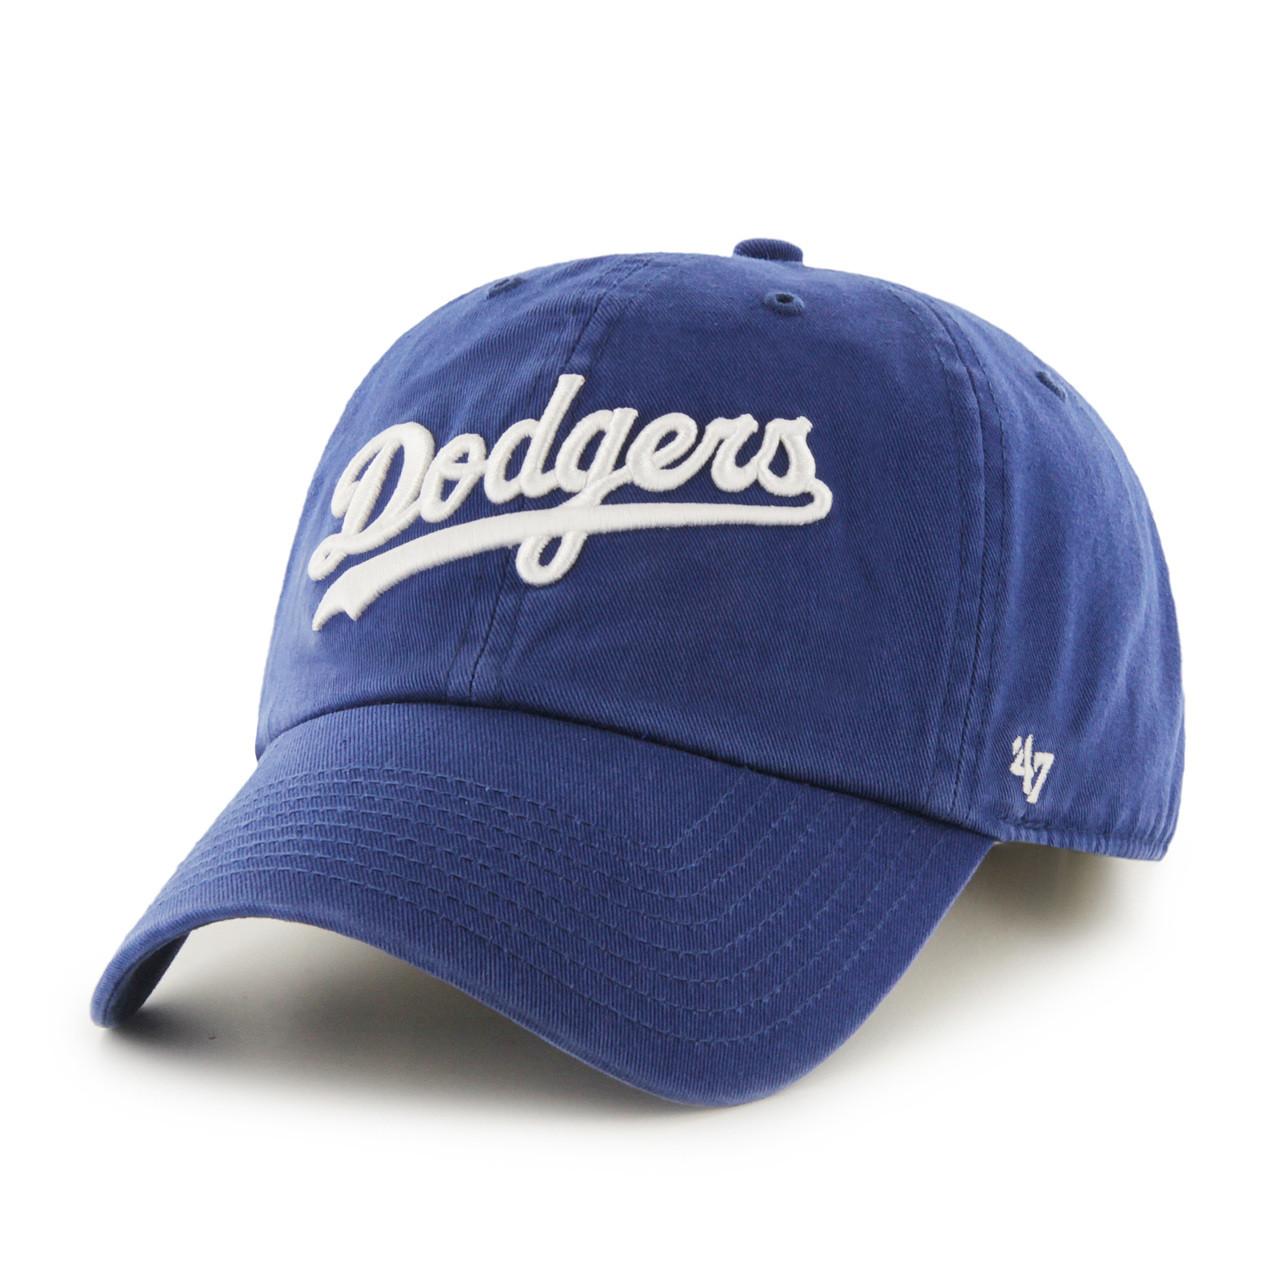 La dodgers script blue 47brand mlb strapback clean up hat buycottarizona Image collections